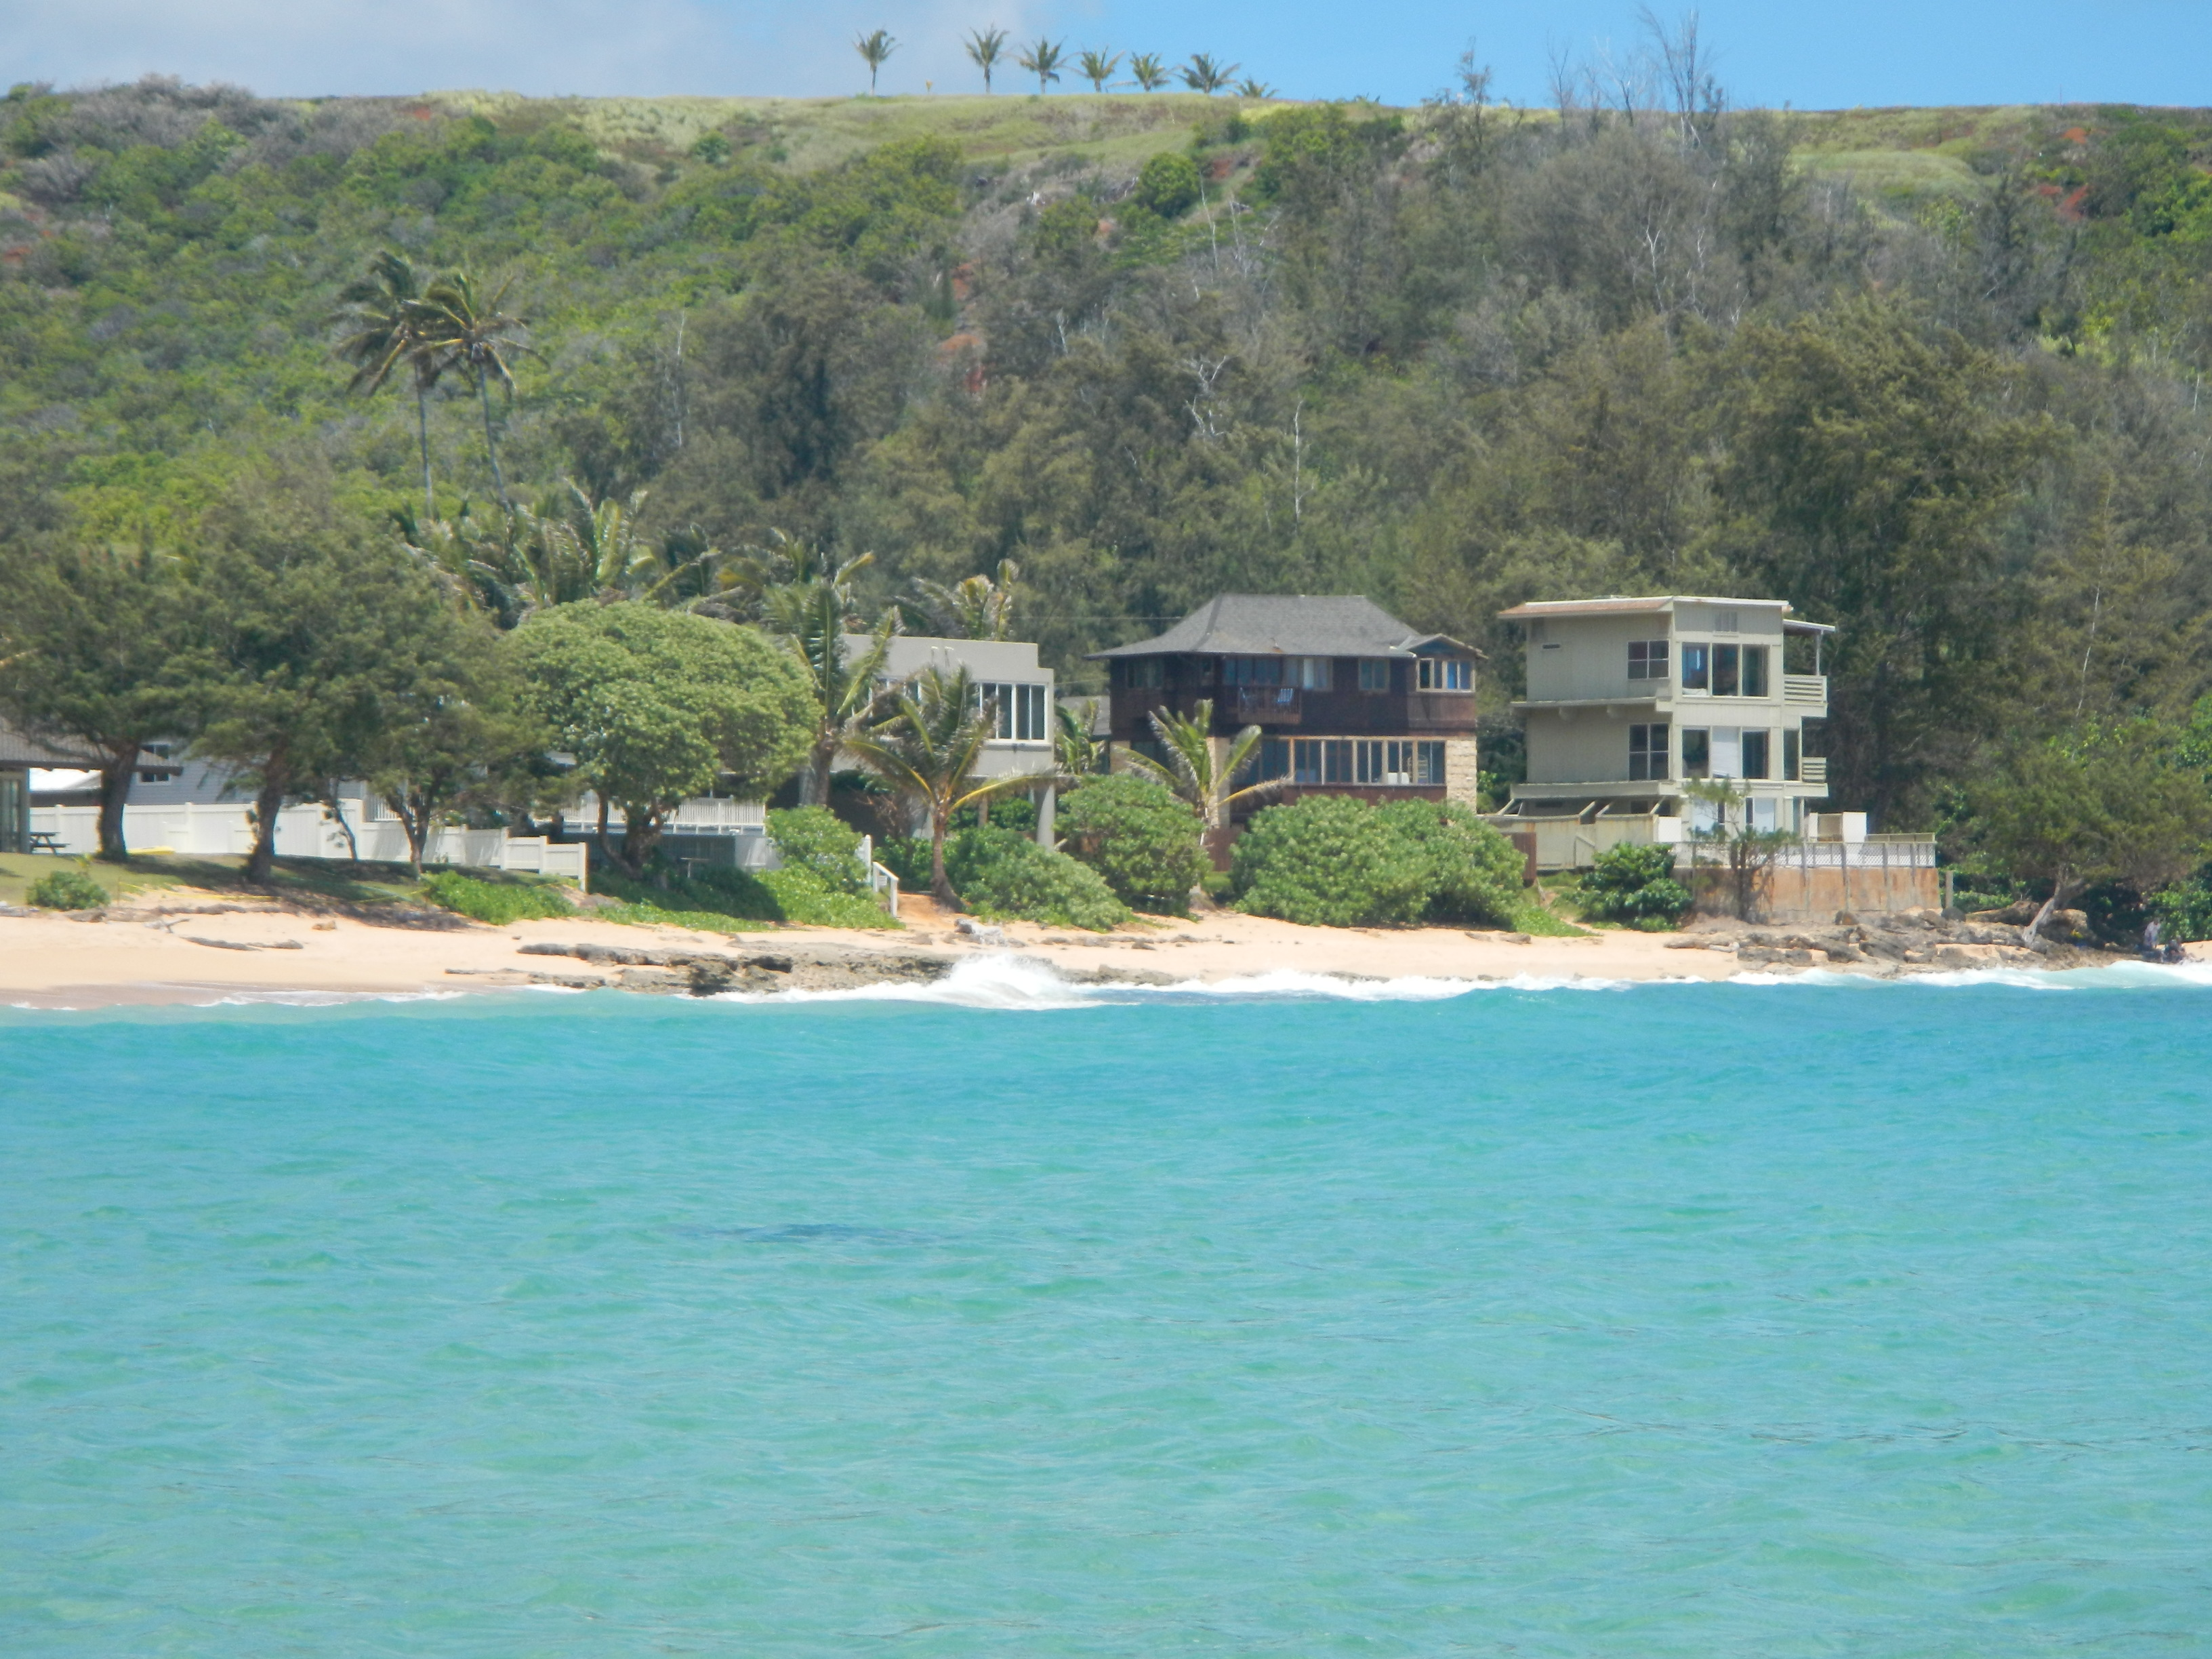 Beach Houses with Path to Beach